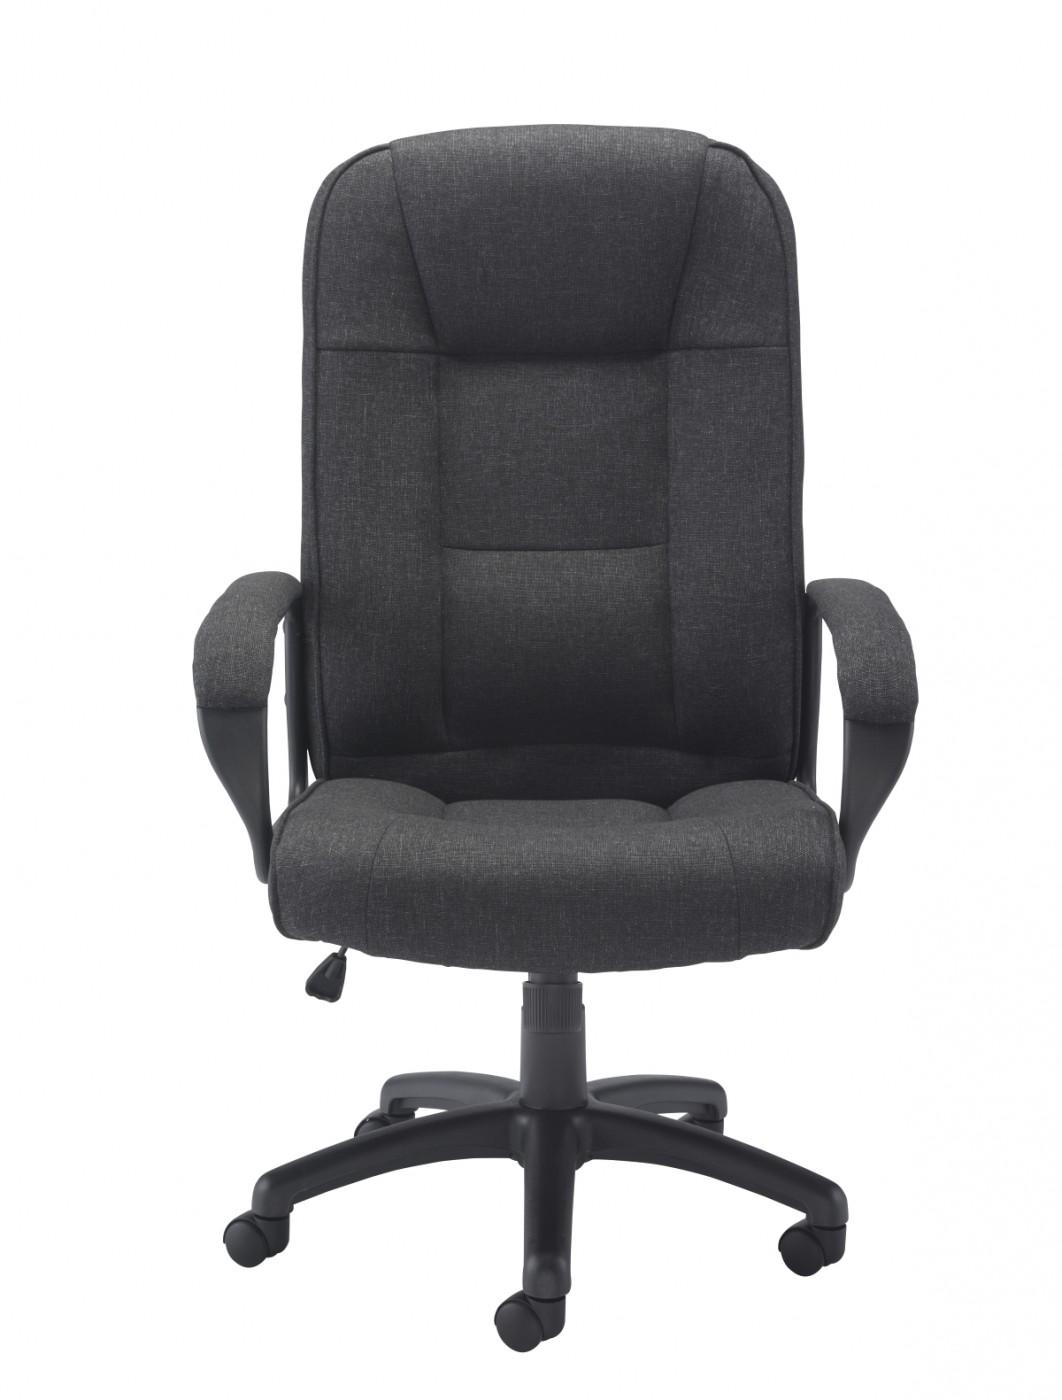 desk chair fabric keekaroo high parts office chairs tc keno ch0137 121